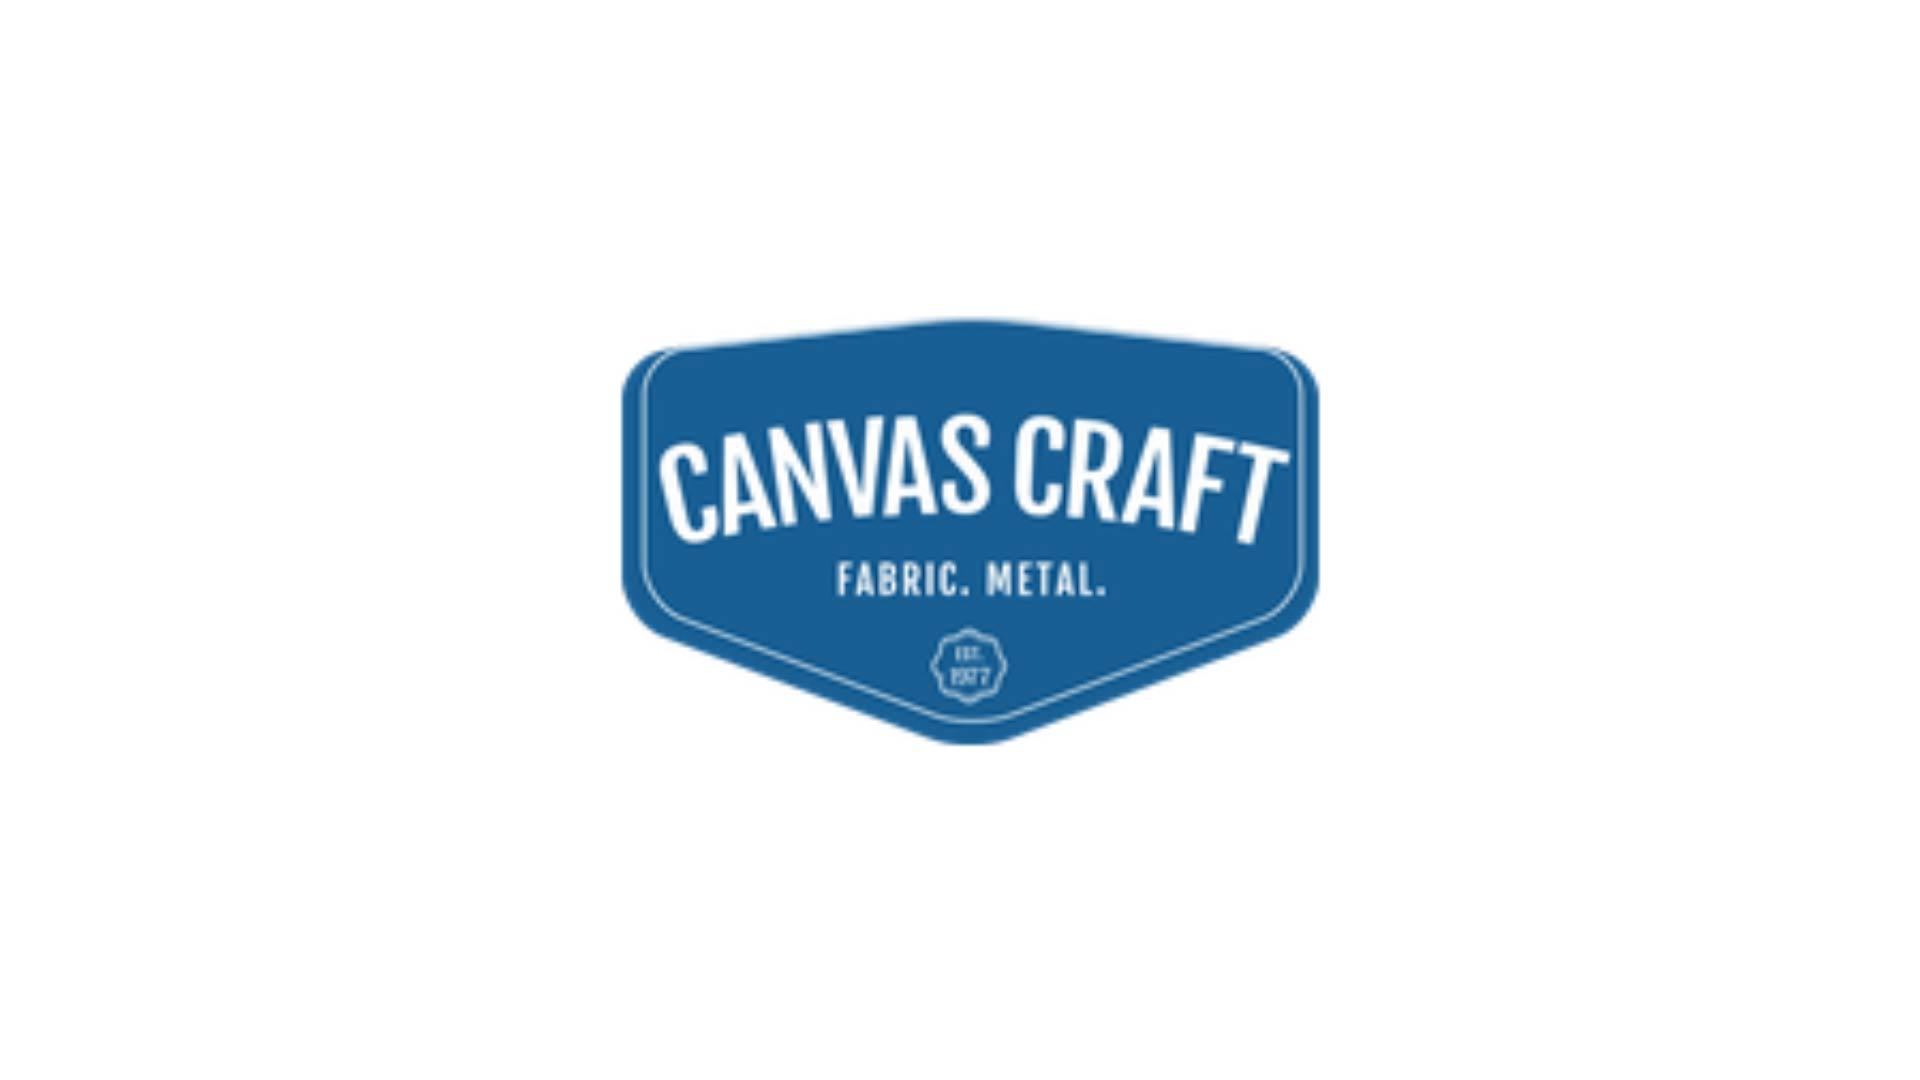 Canvas Craft